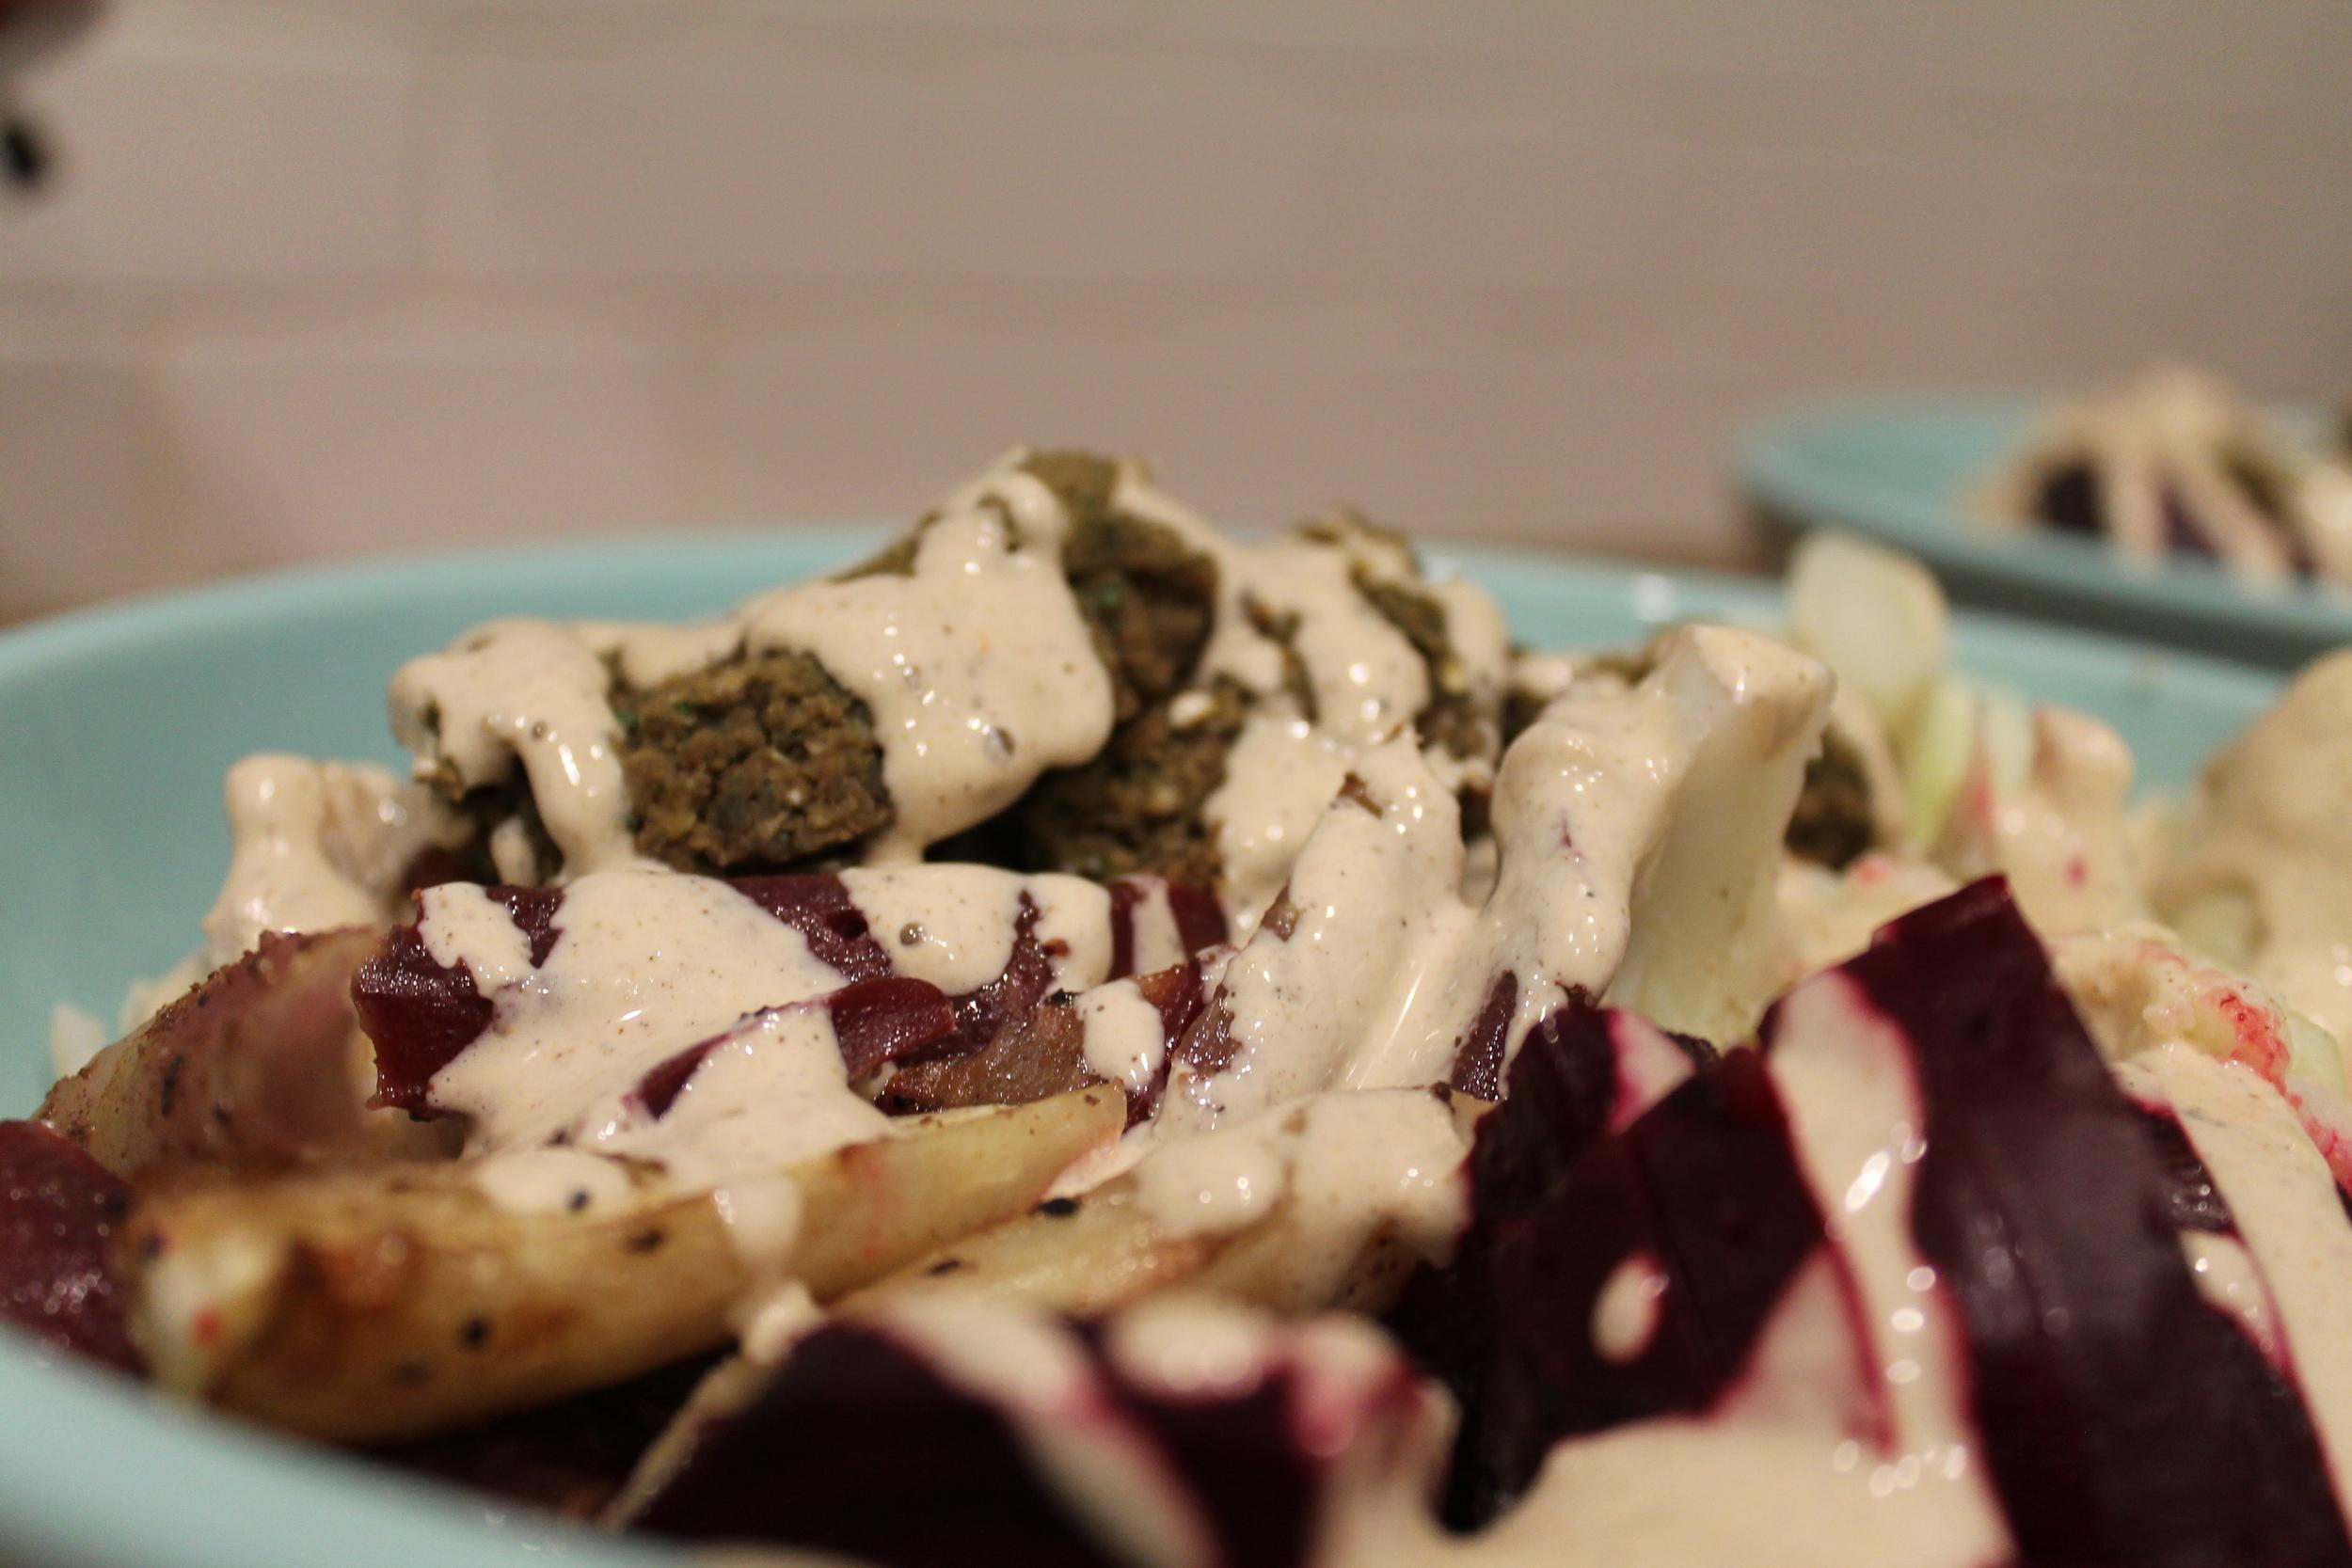 Tahini Buddha Bowl with Baked Falafel - Gluten-Free & Vegan Hearty Soul Food. By www.fernsandpeonies.com